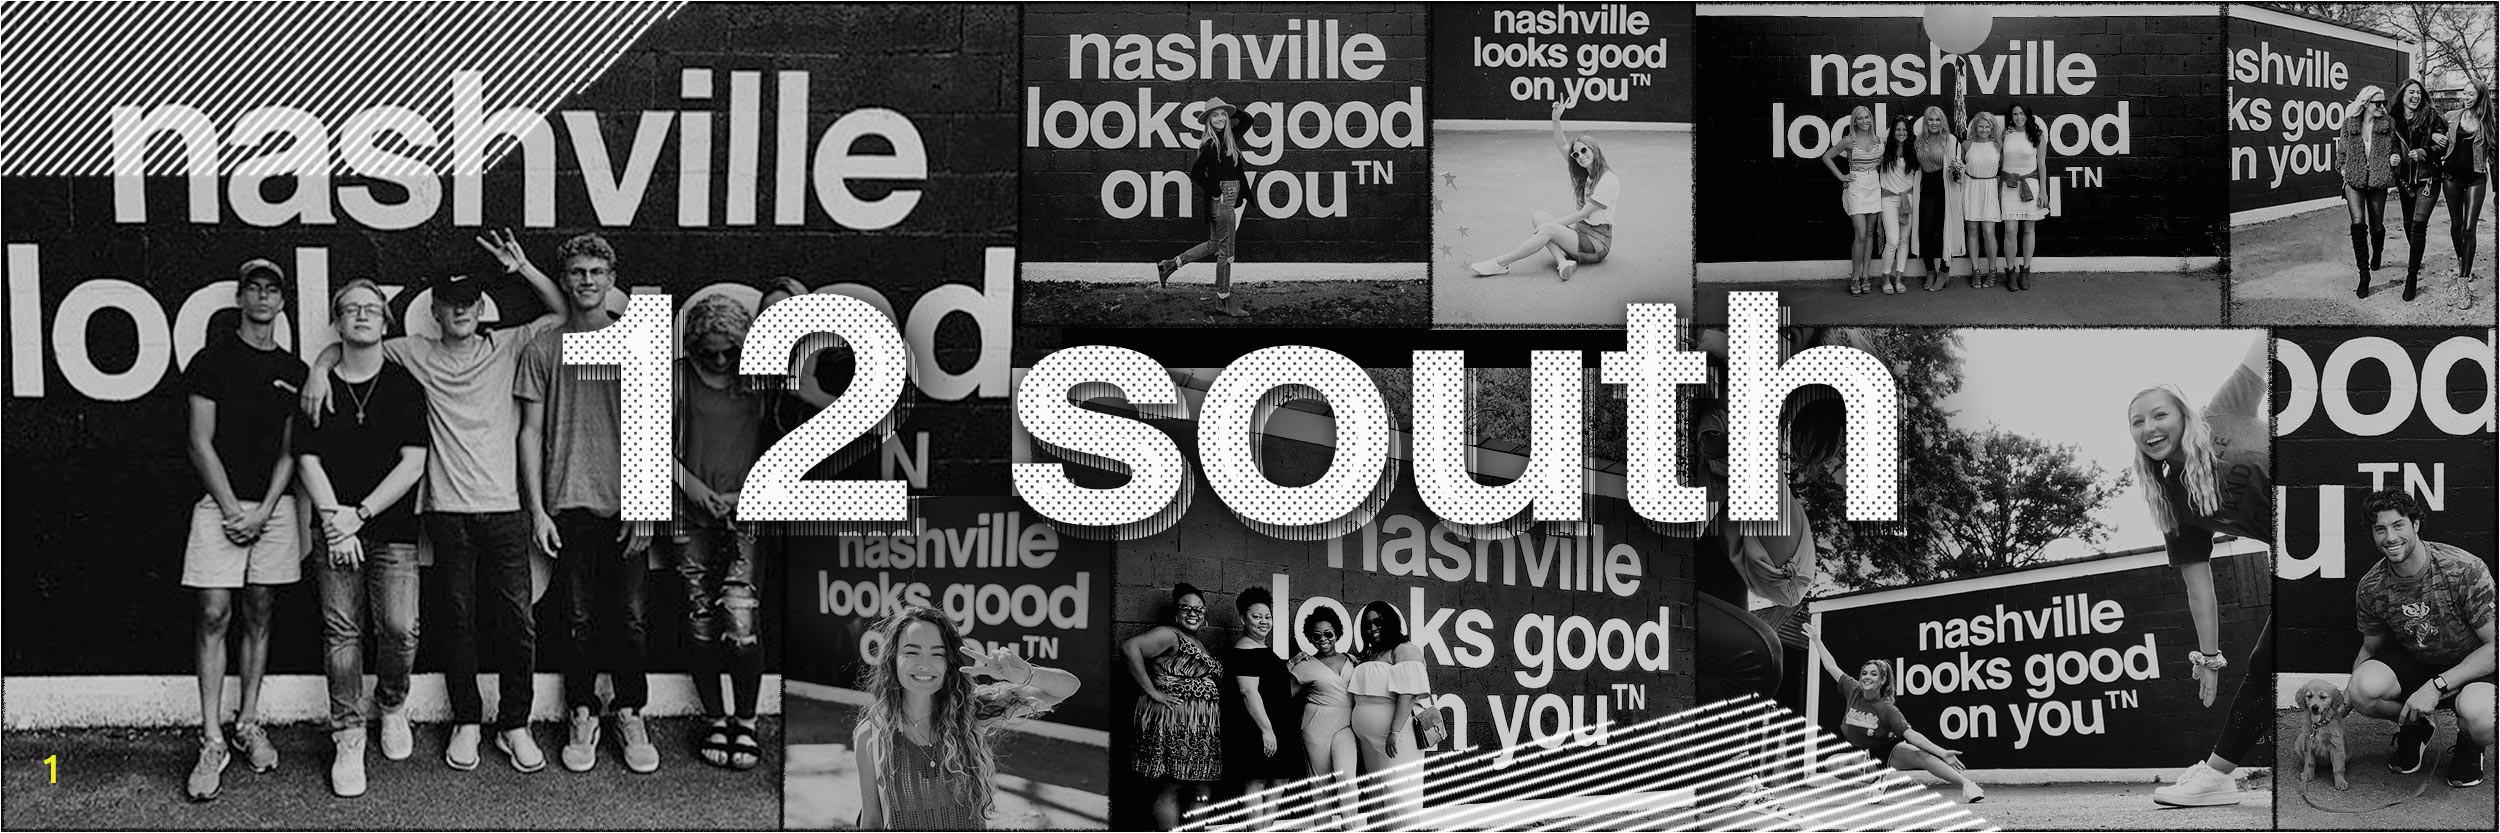 Wall Murals Nashville Tn the Plete List Nashville Looks Good On You Mural